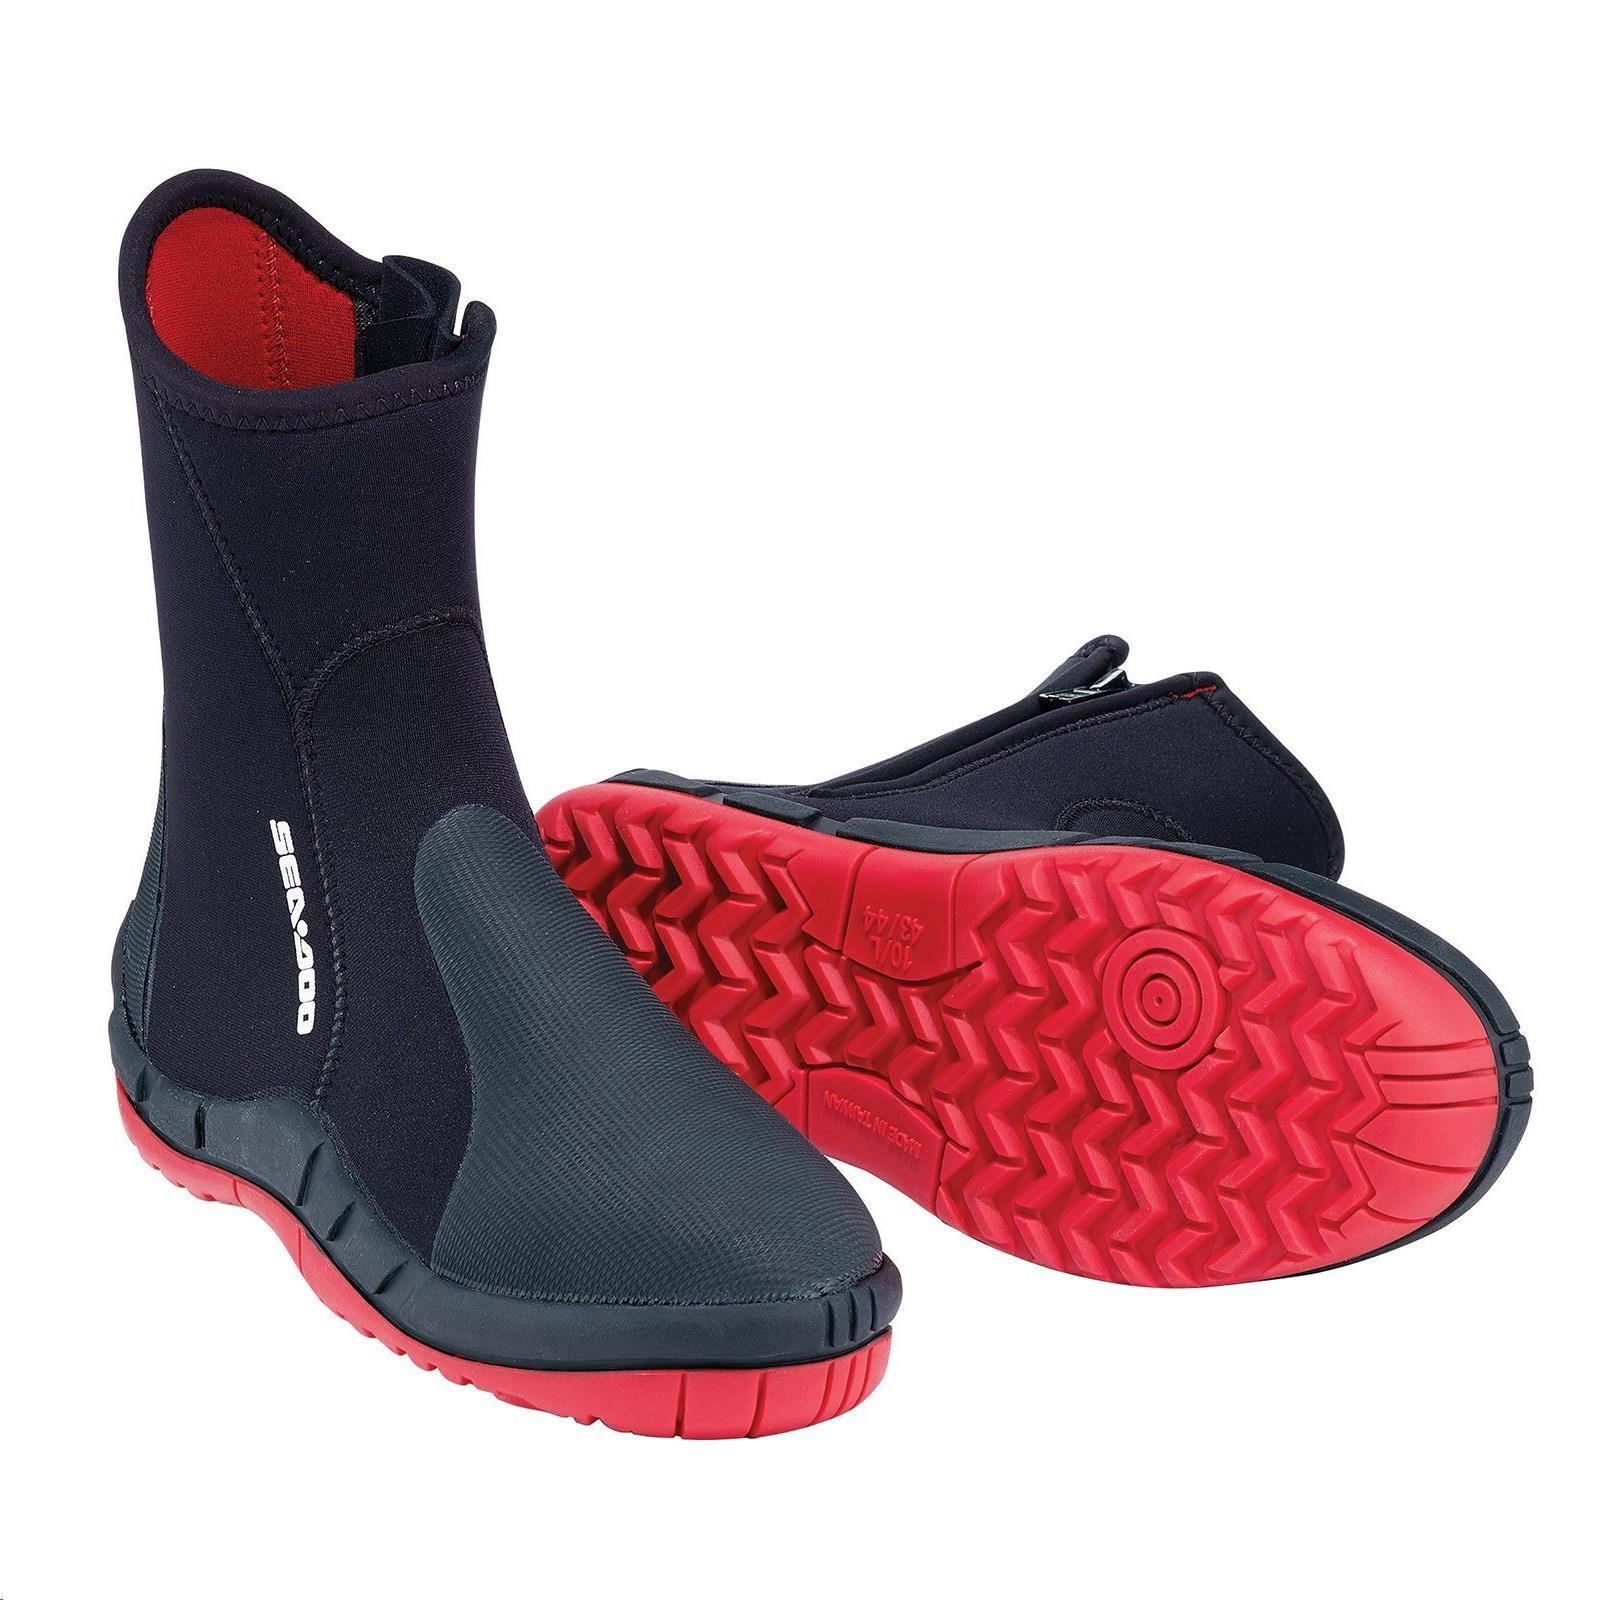 ee2174d7b13f85 Sea-Doo Neoprene Booties for sale in Ayr, ON | Team Vincent Motorsports  (800) 221-4360